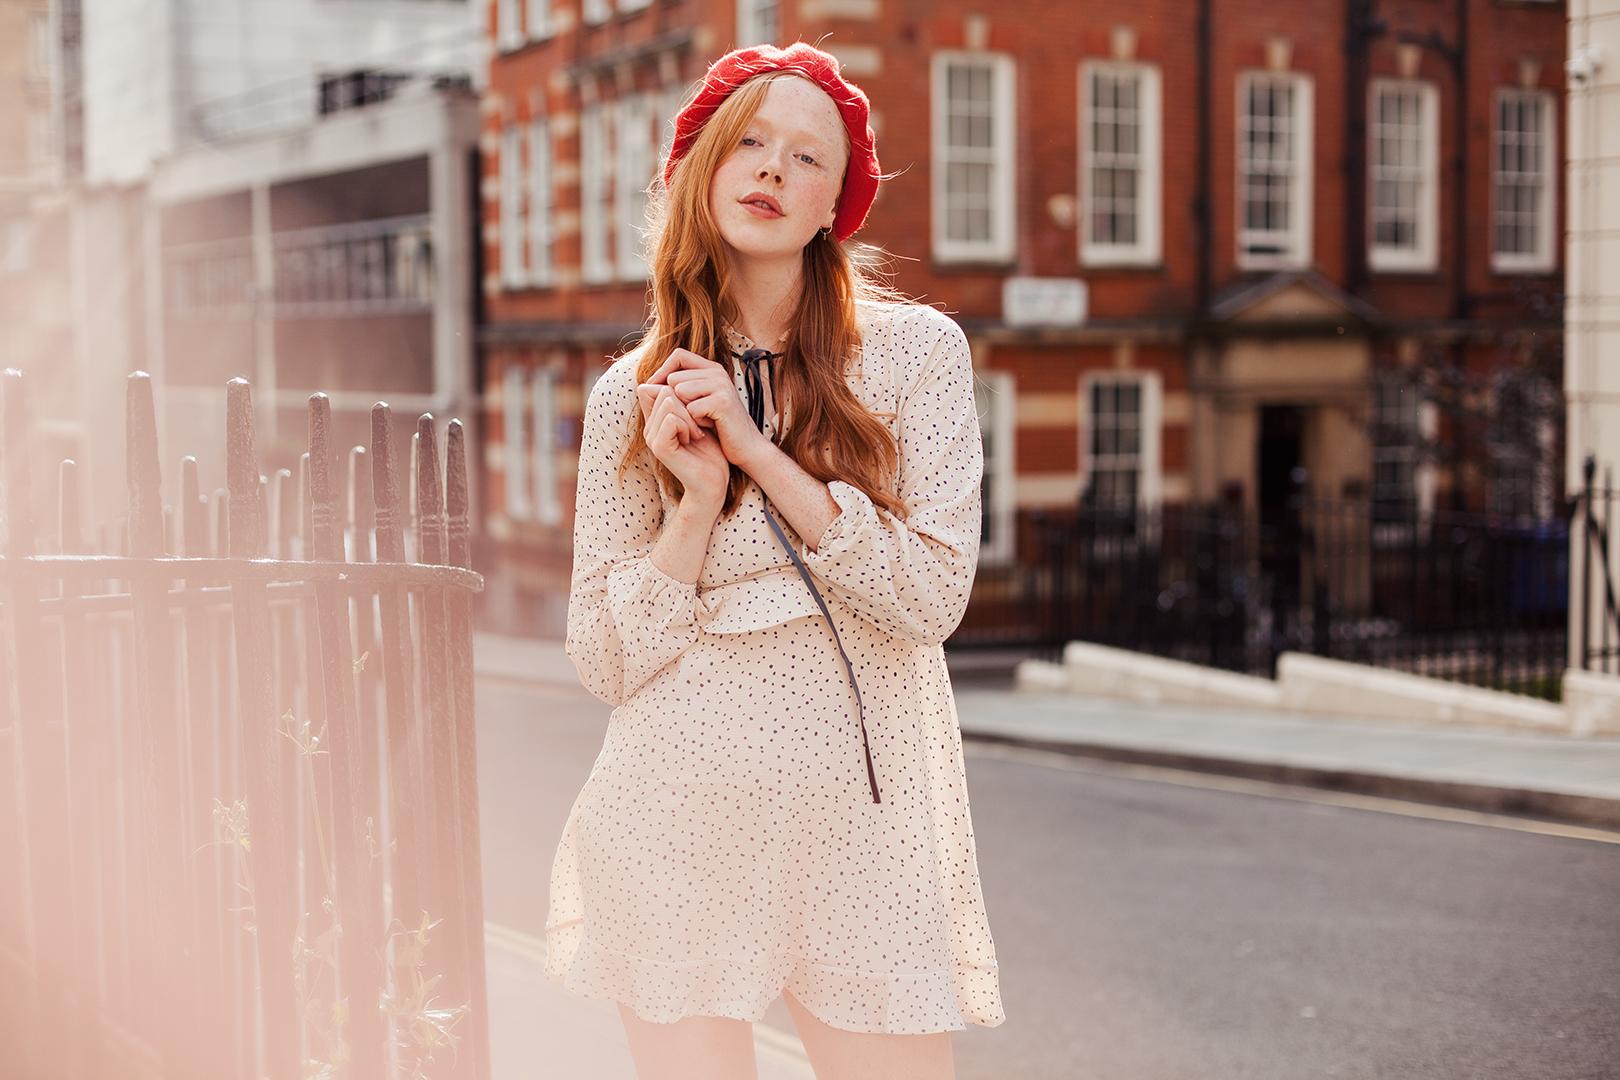 Redhead fashion blogger Holly Rebecca White by Ailera Stone